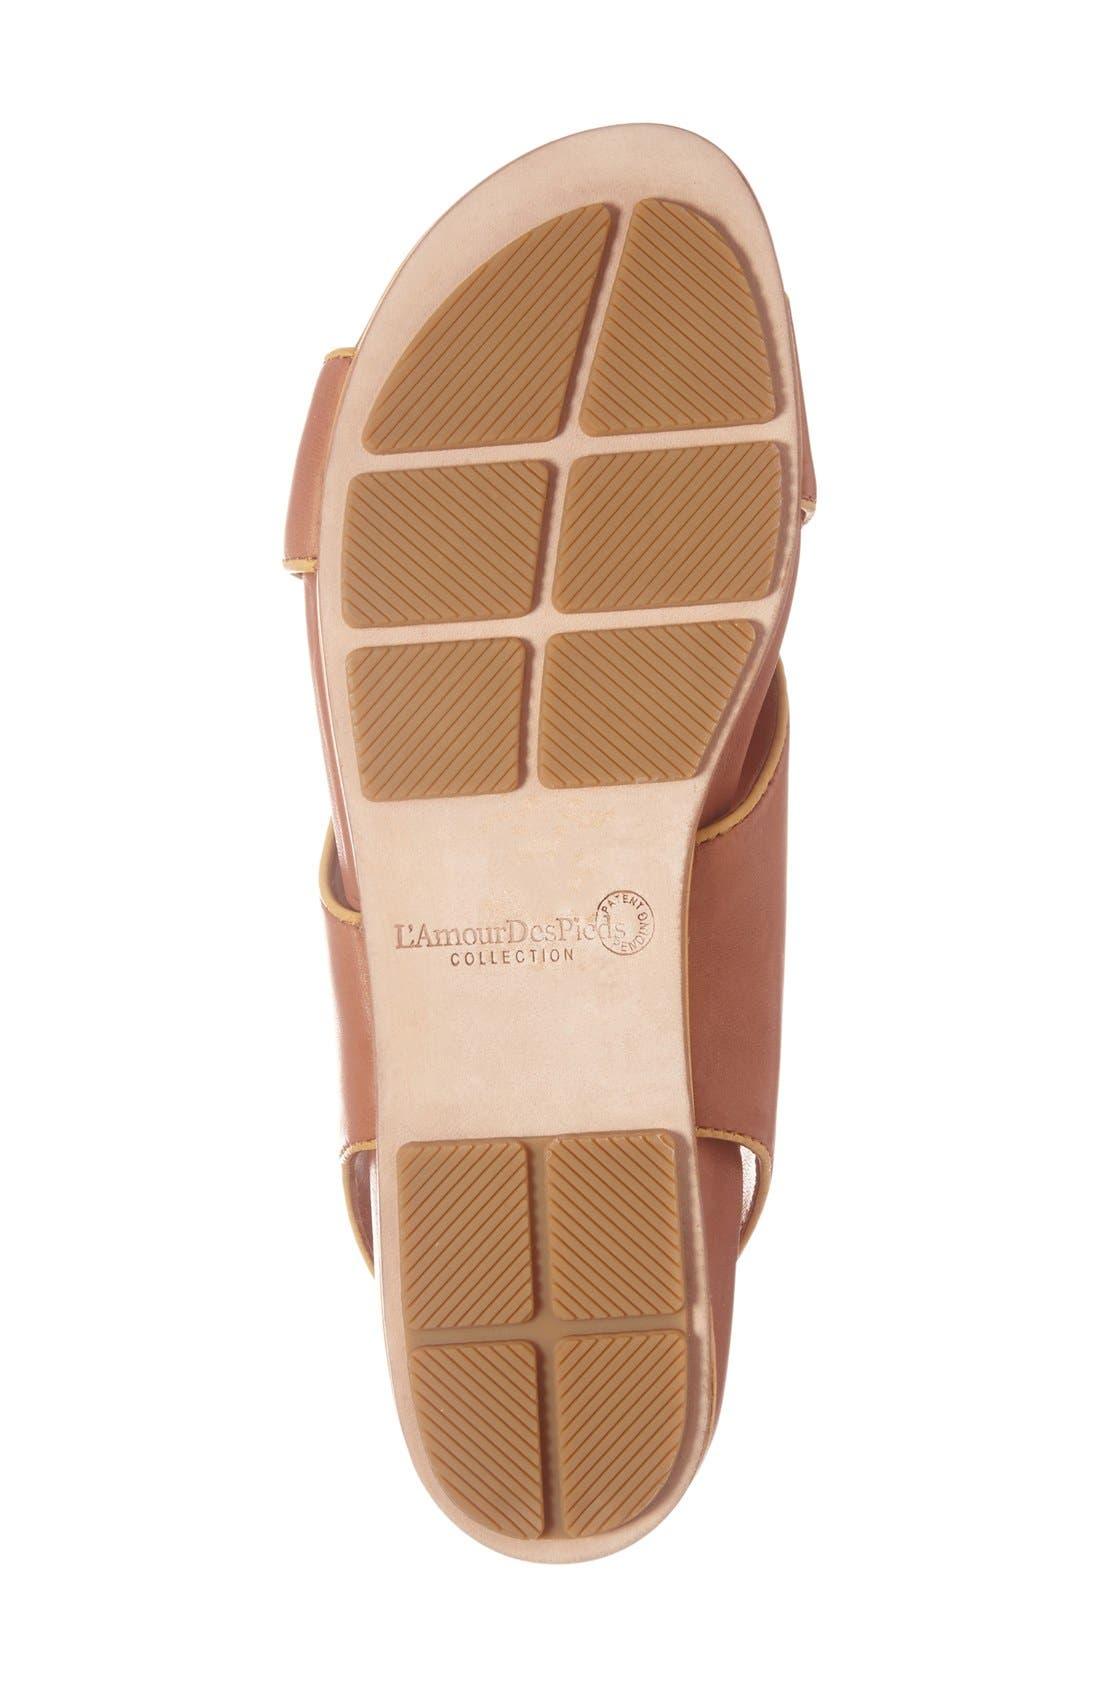 'Dallon' Crisscross Flat Sandal,                             Alternate thumbnail 4, color,                             Cognac Leather